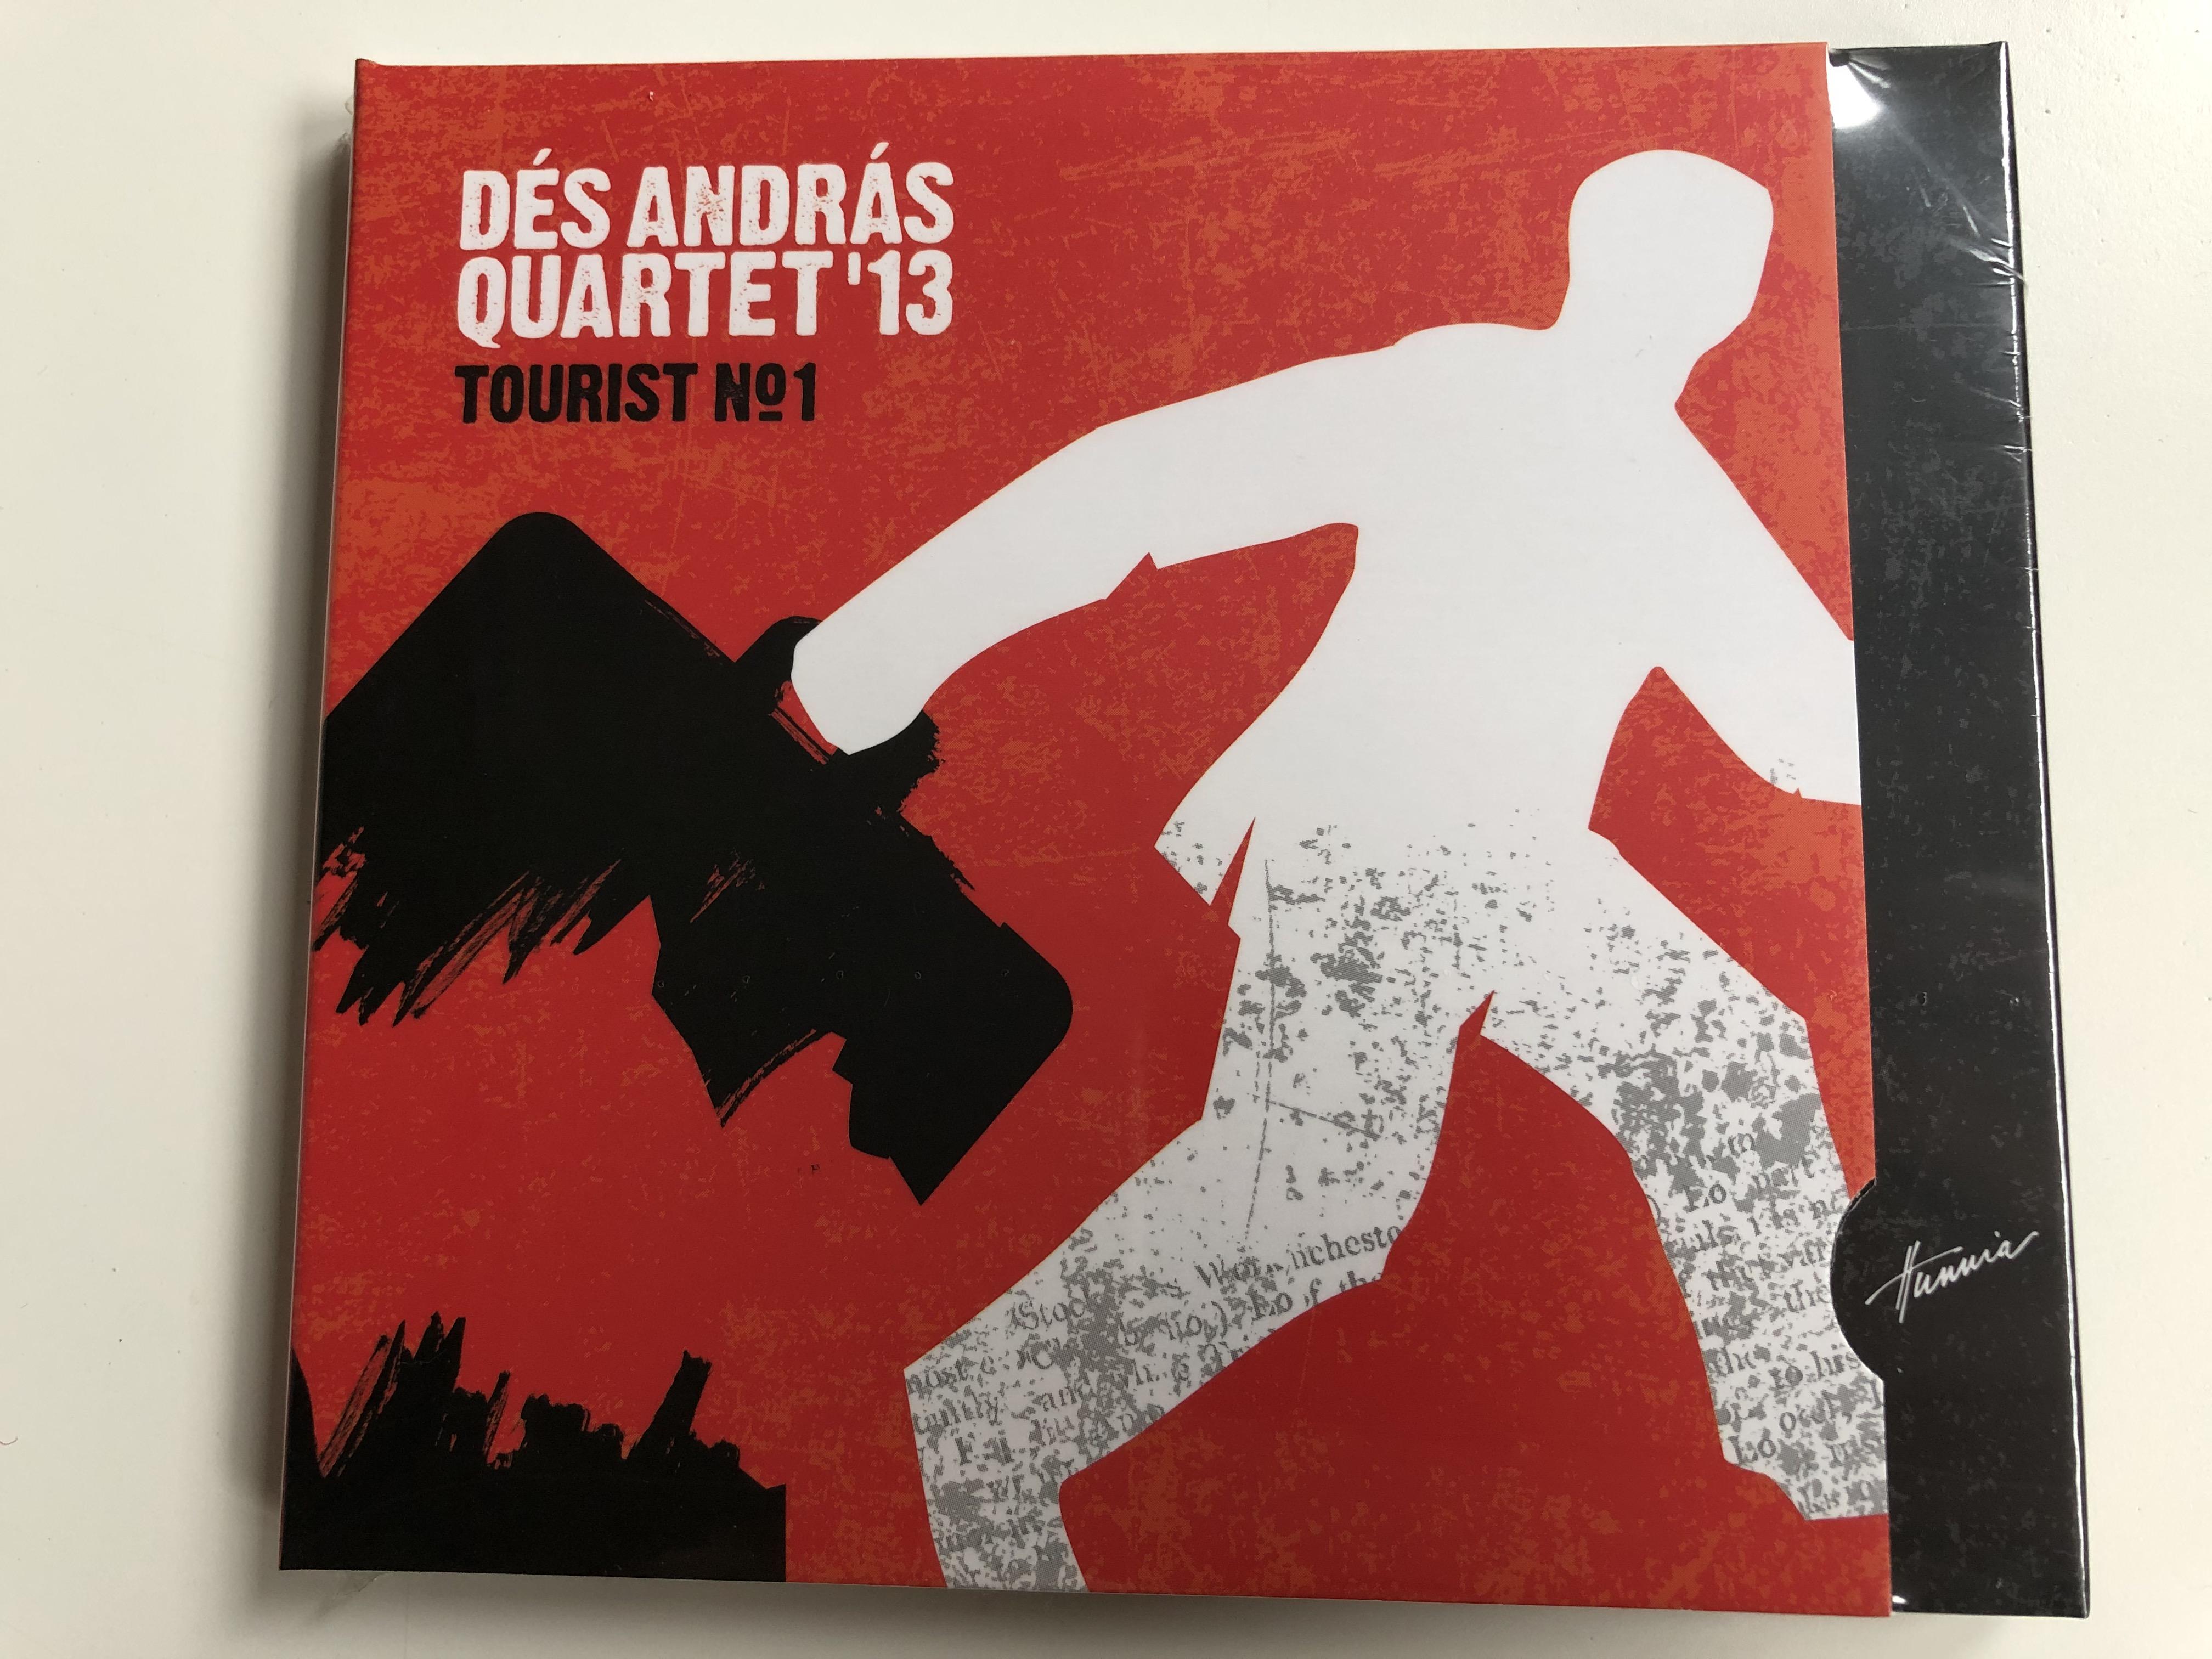 d-s-andr-s-quartet-13-tourist-no.-1-hunnia-records-film-production-audio-cd-2014-hrcd-1401-1-.jpg